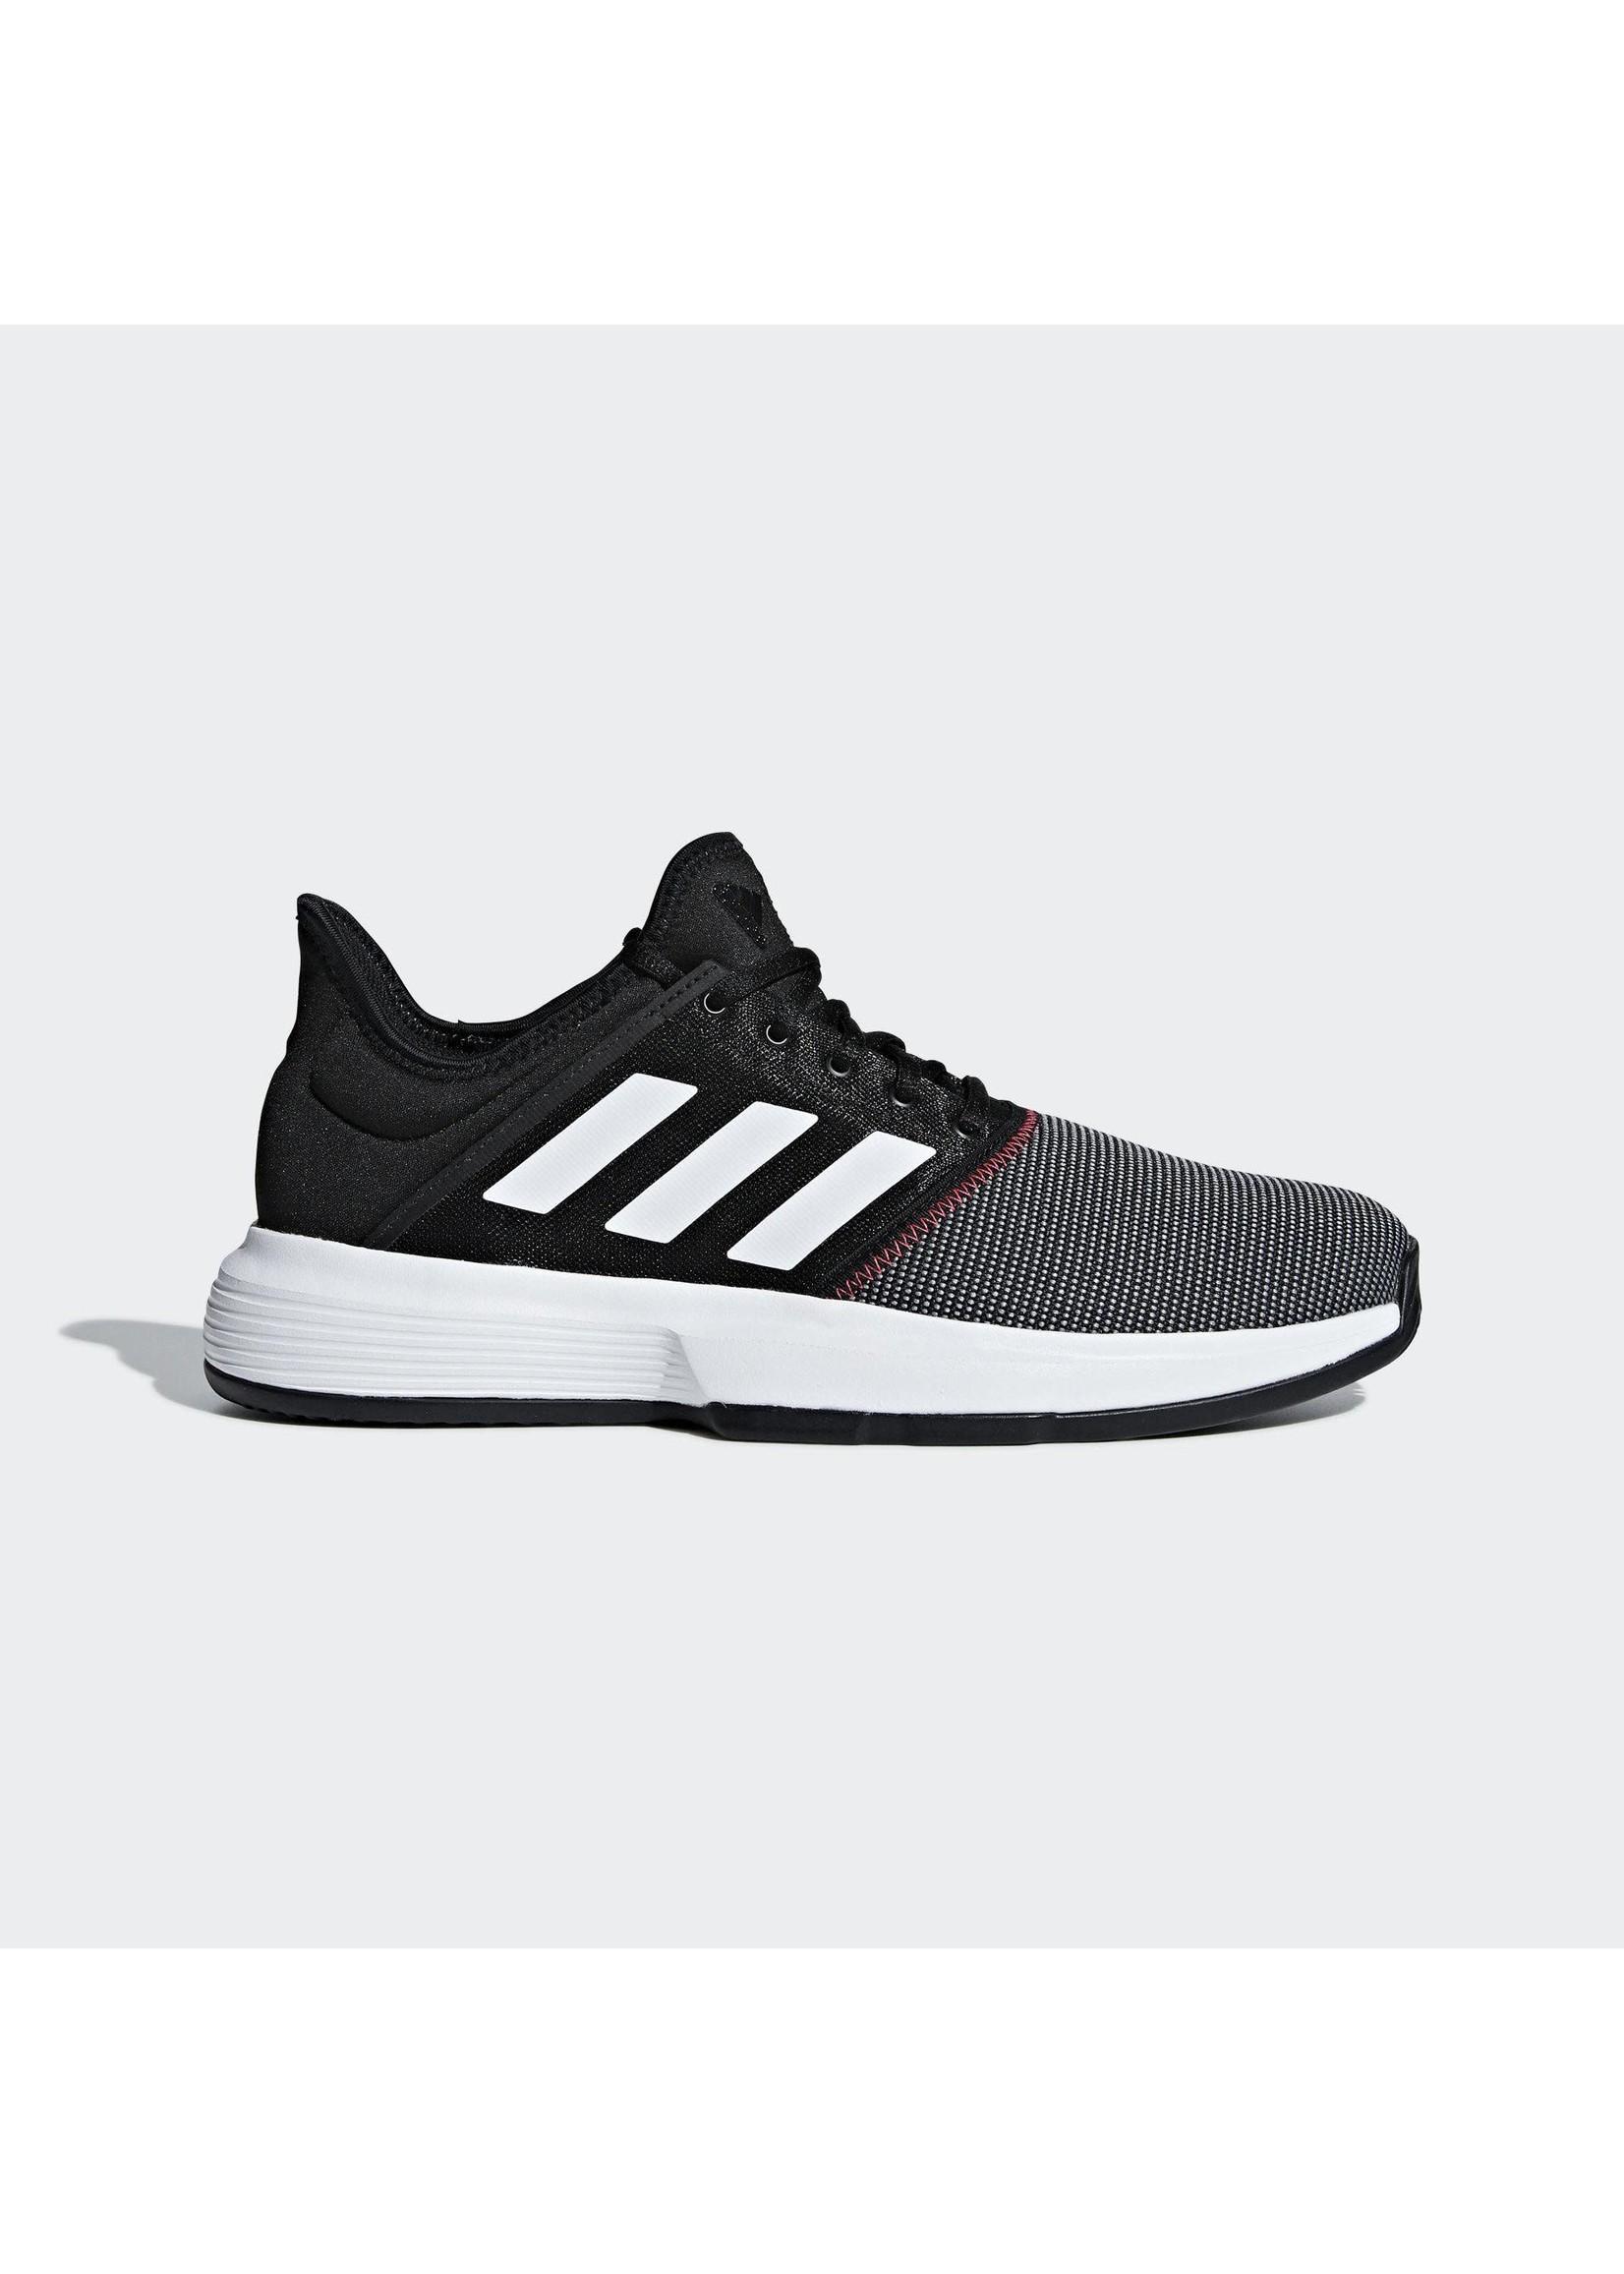 Adidas Adidas Game Court Mens Tennis Shoes (2019)